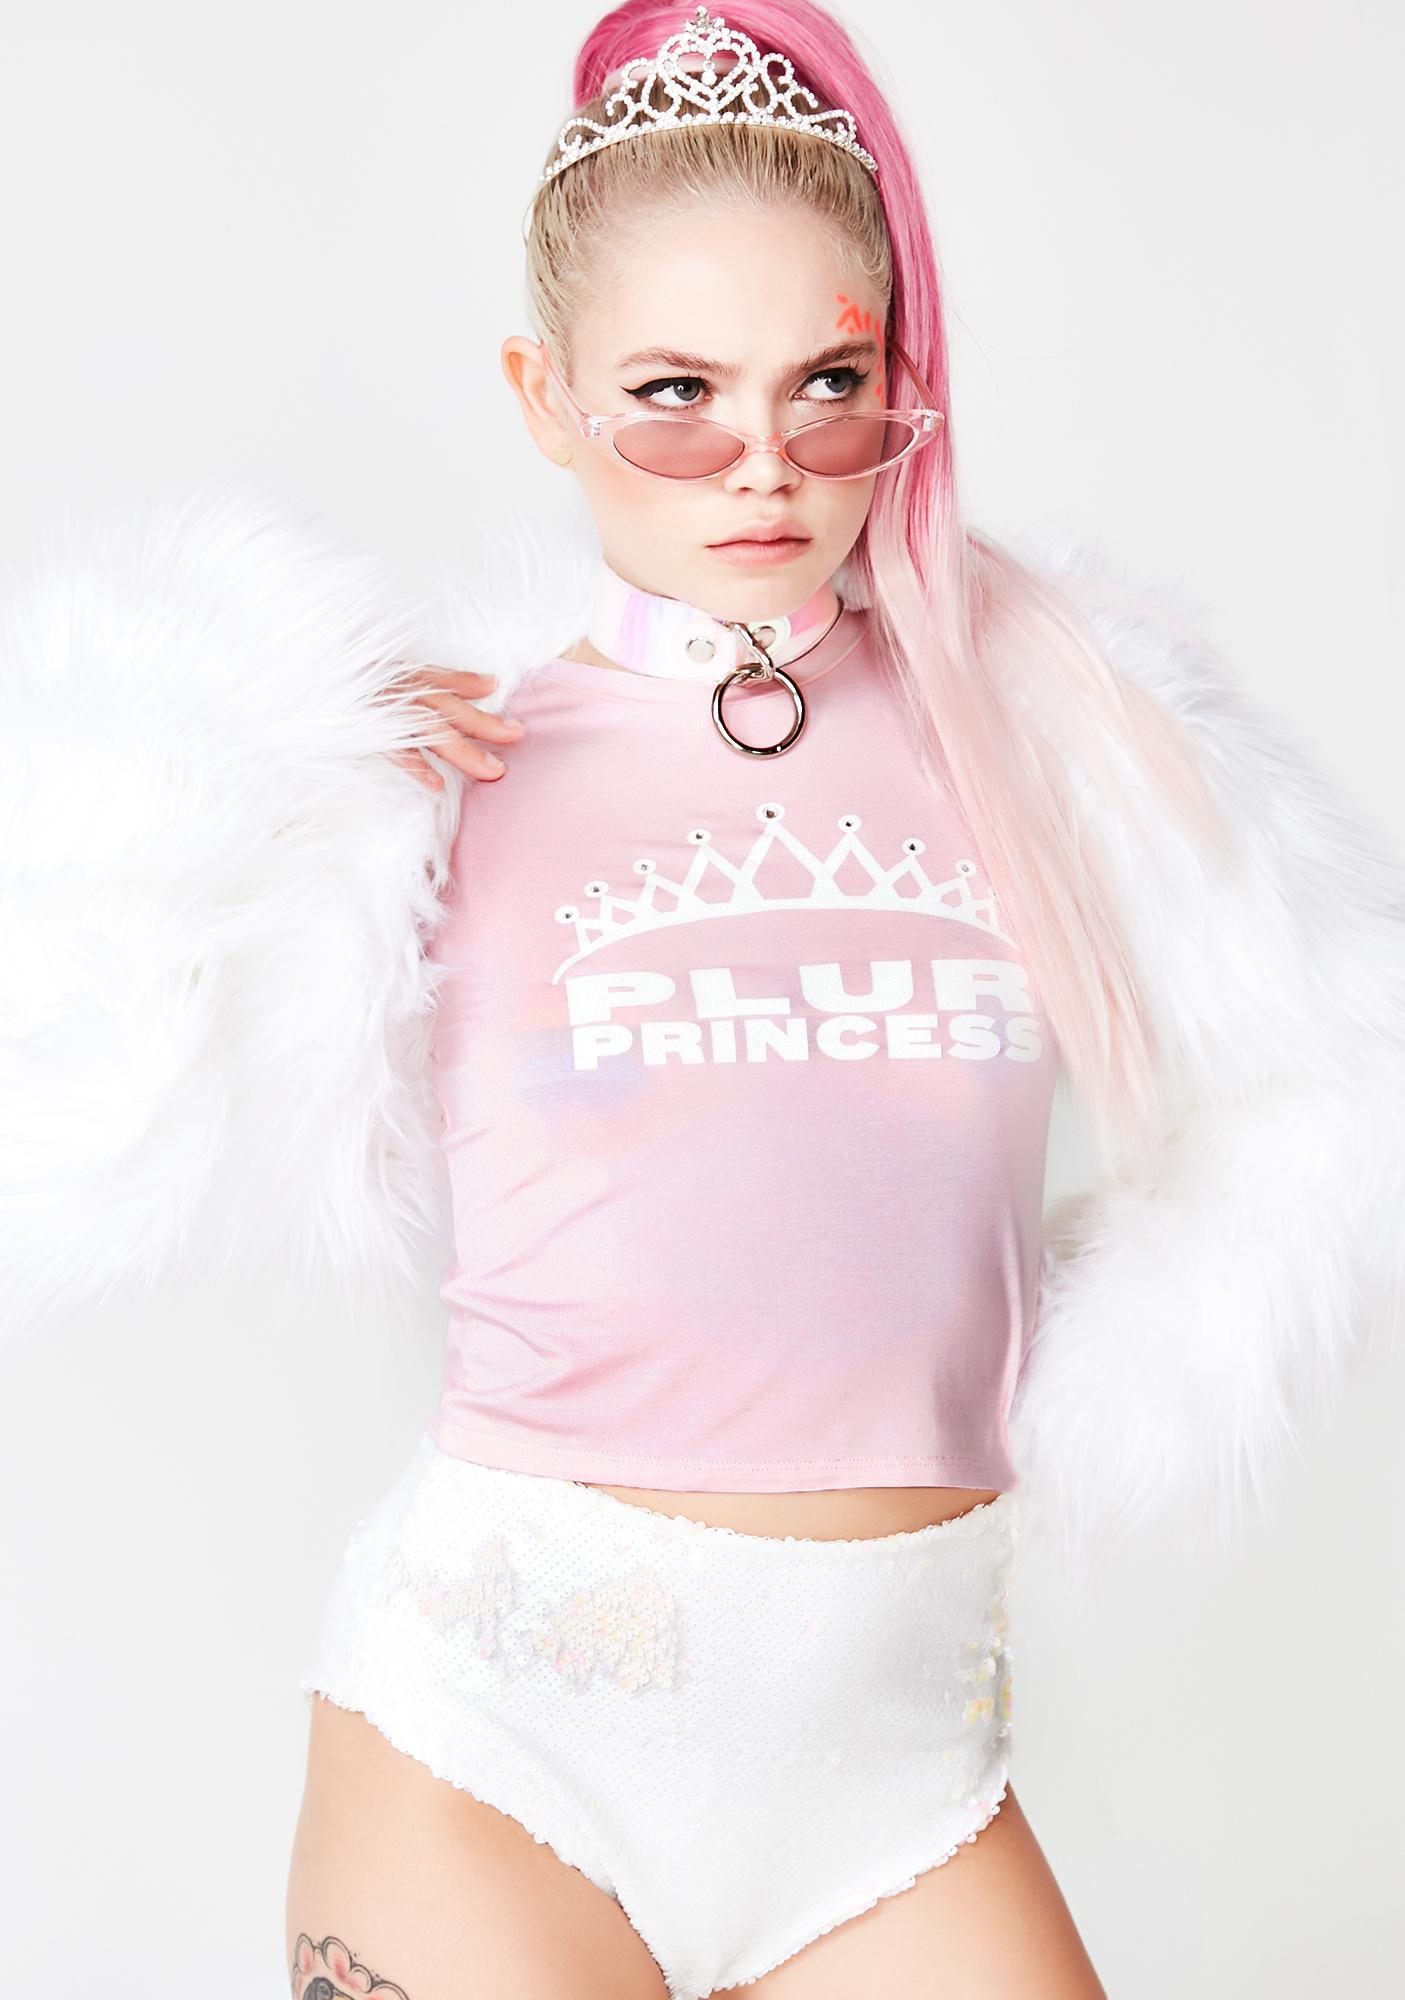 Club Exx Plur Princess Tee